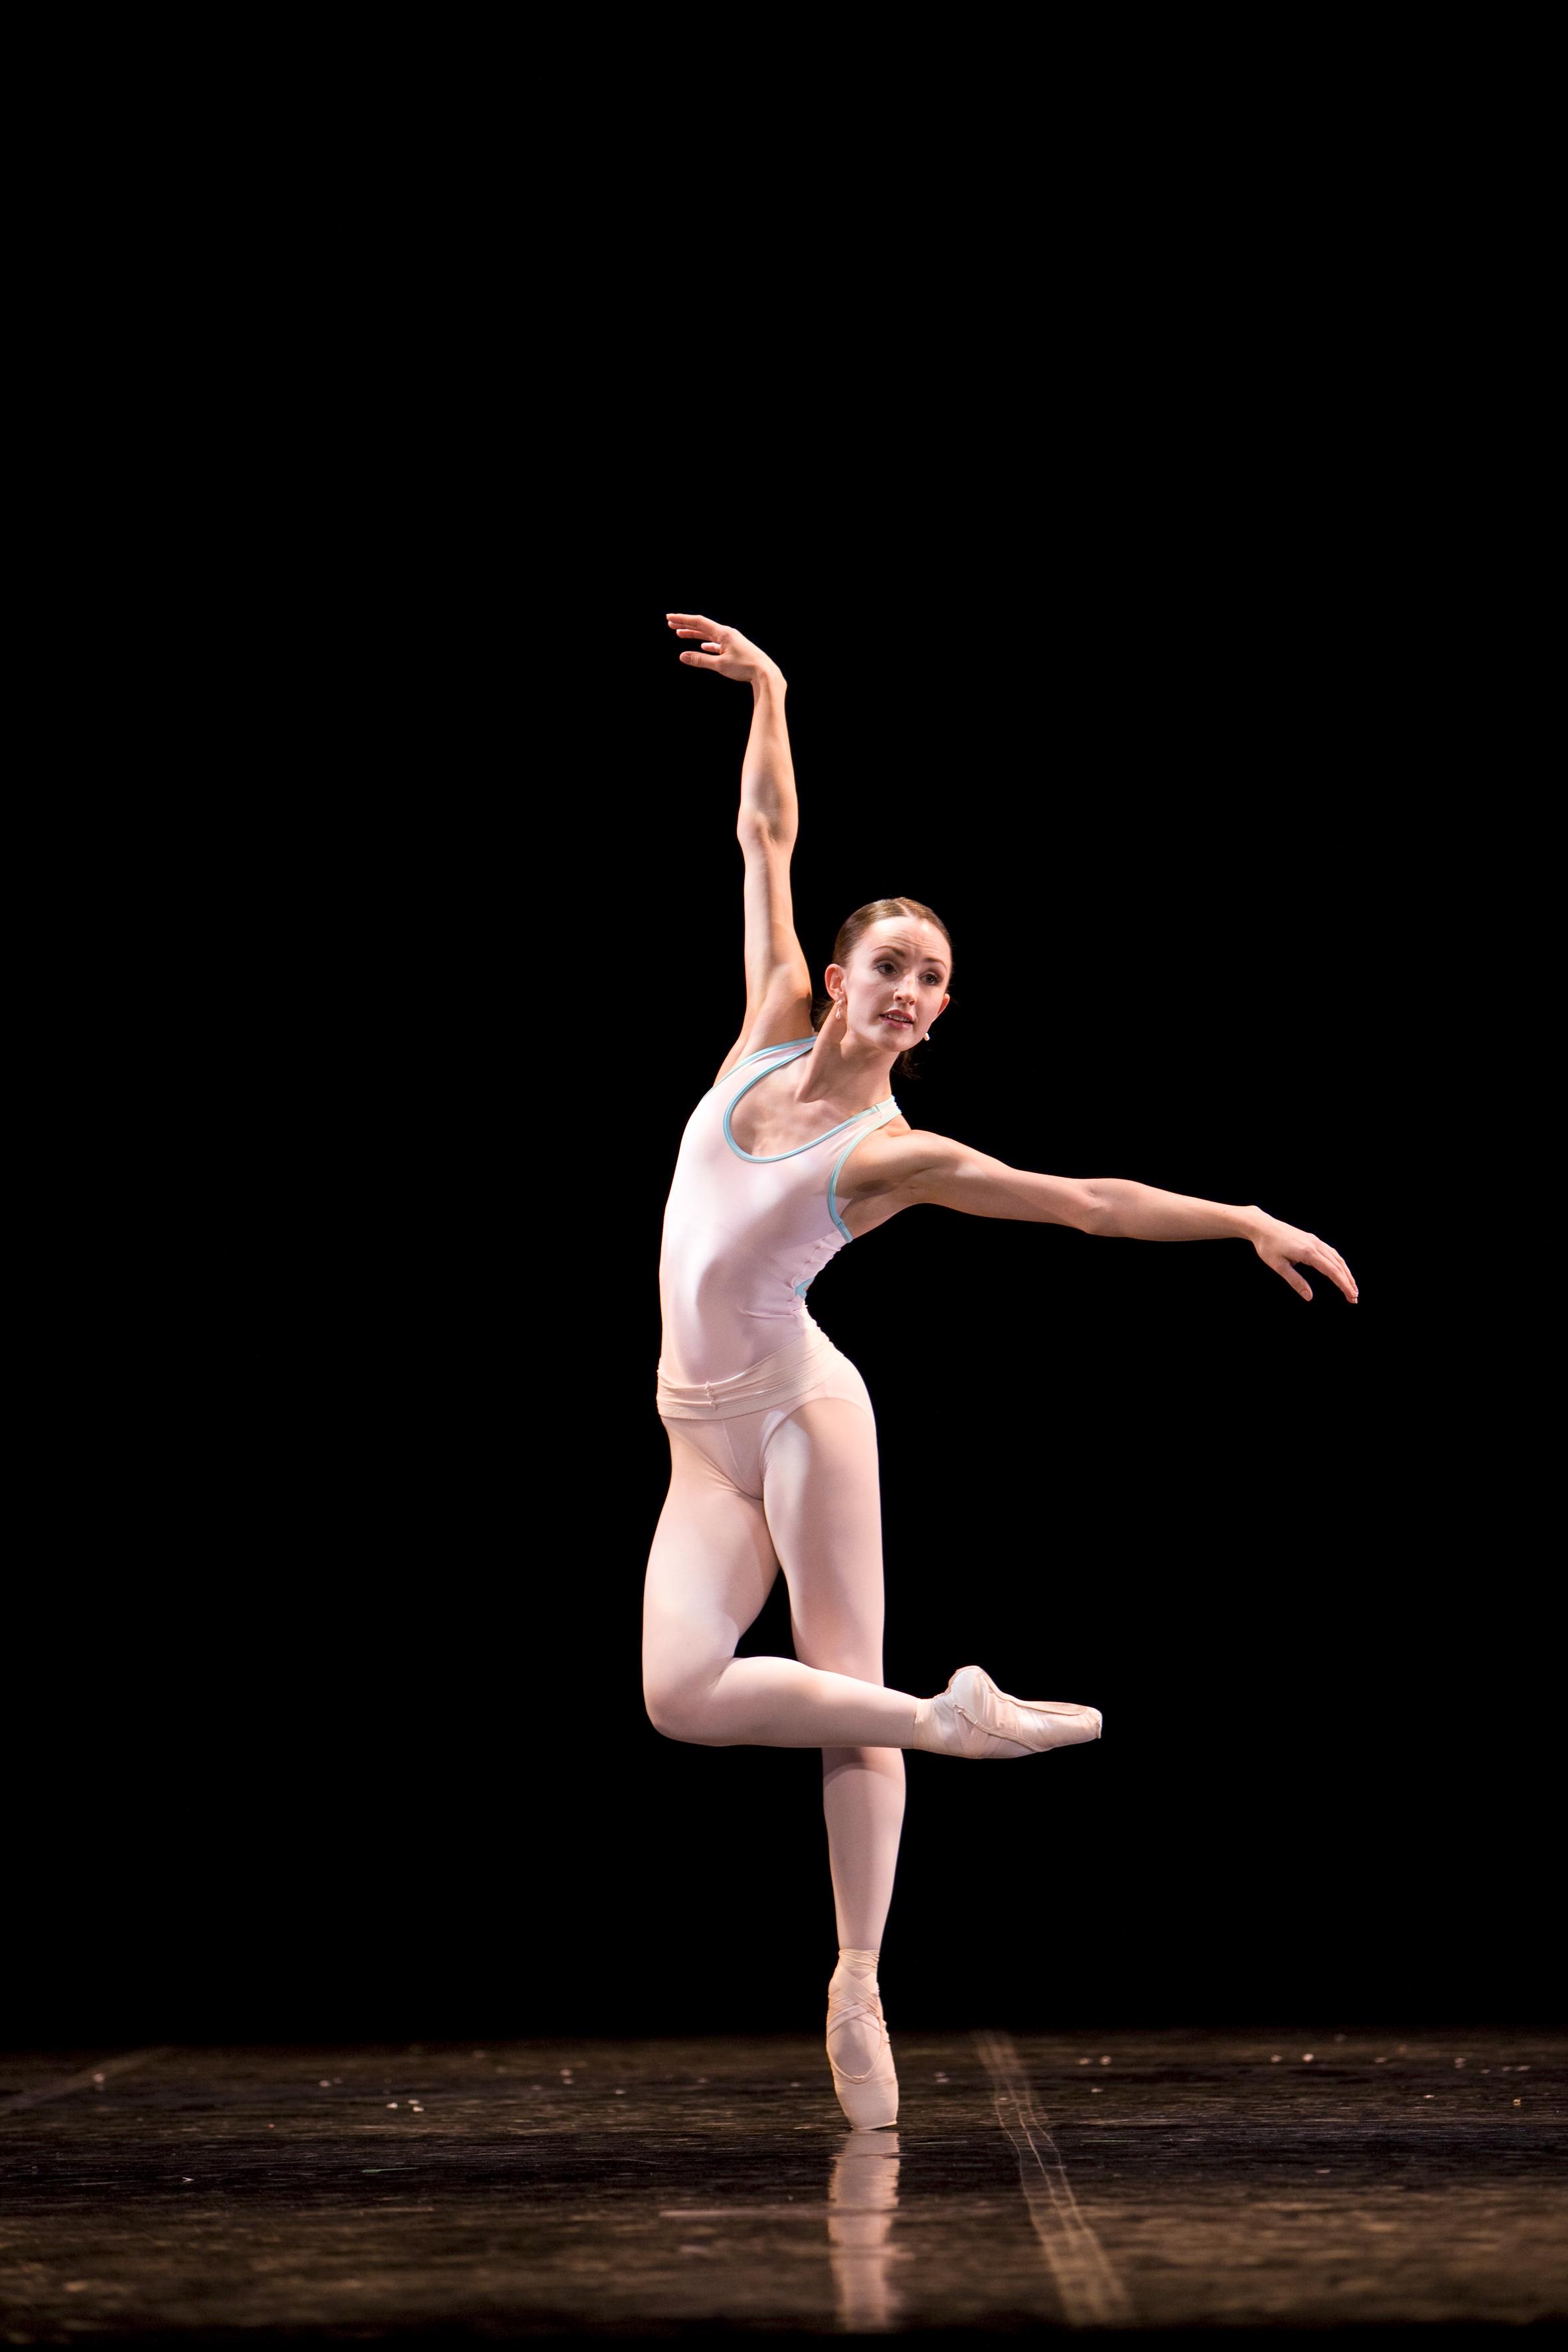 ballet dancer stands on pointe